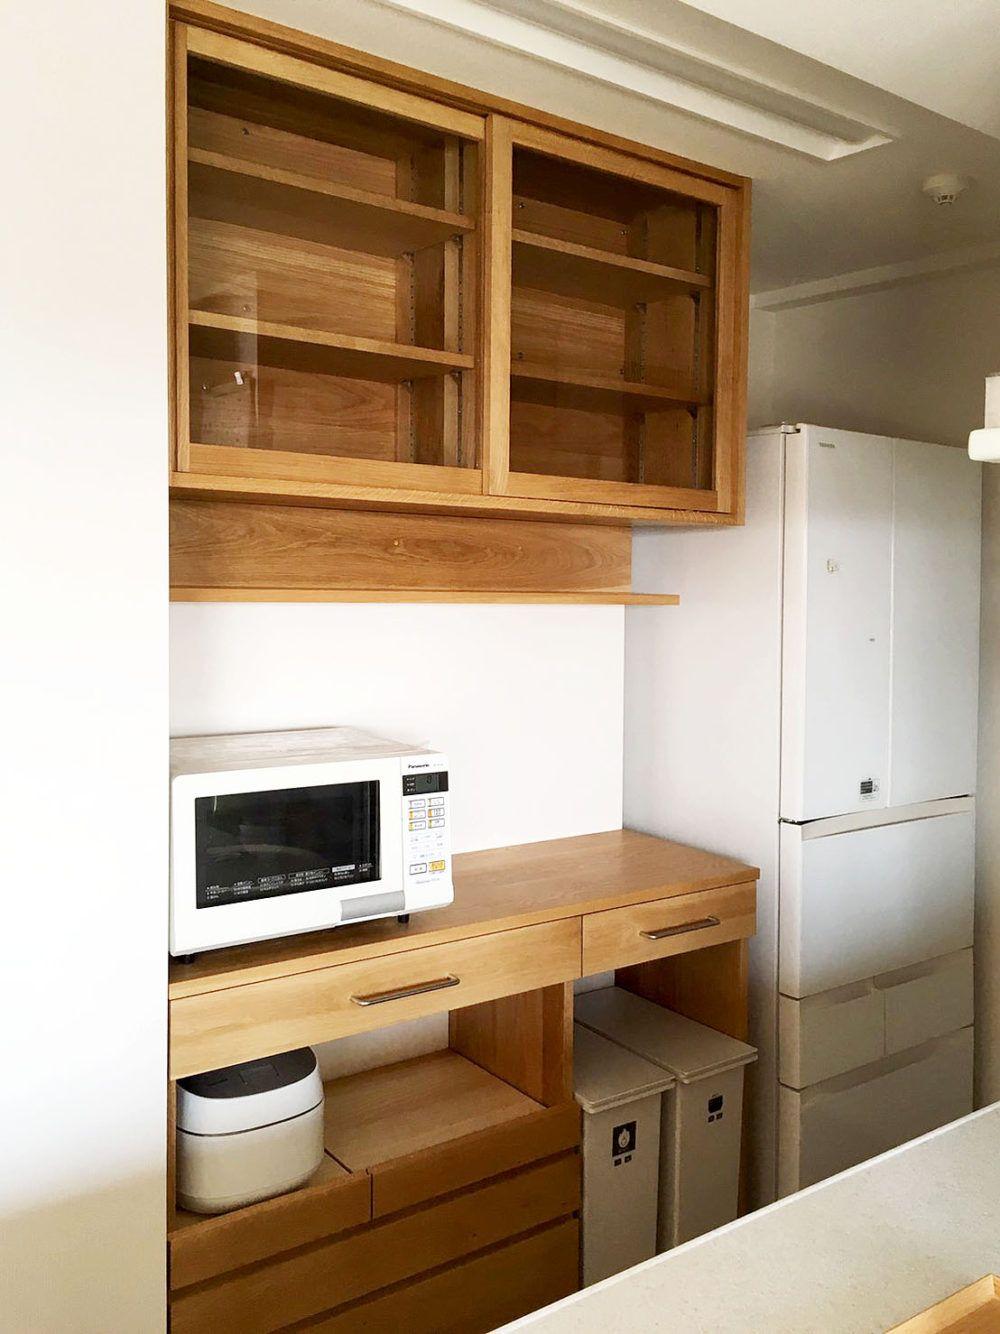 Oguma 大阪 北摂 吹田市千里山に事務所と豊中市に工房があるオーダー家具製作 キッチン制作 住宅設計 カップボード インテリア 収納 キッチン 背面収納